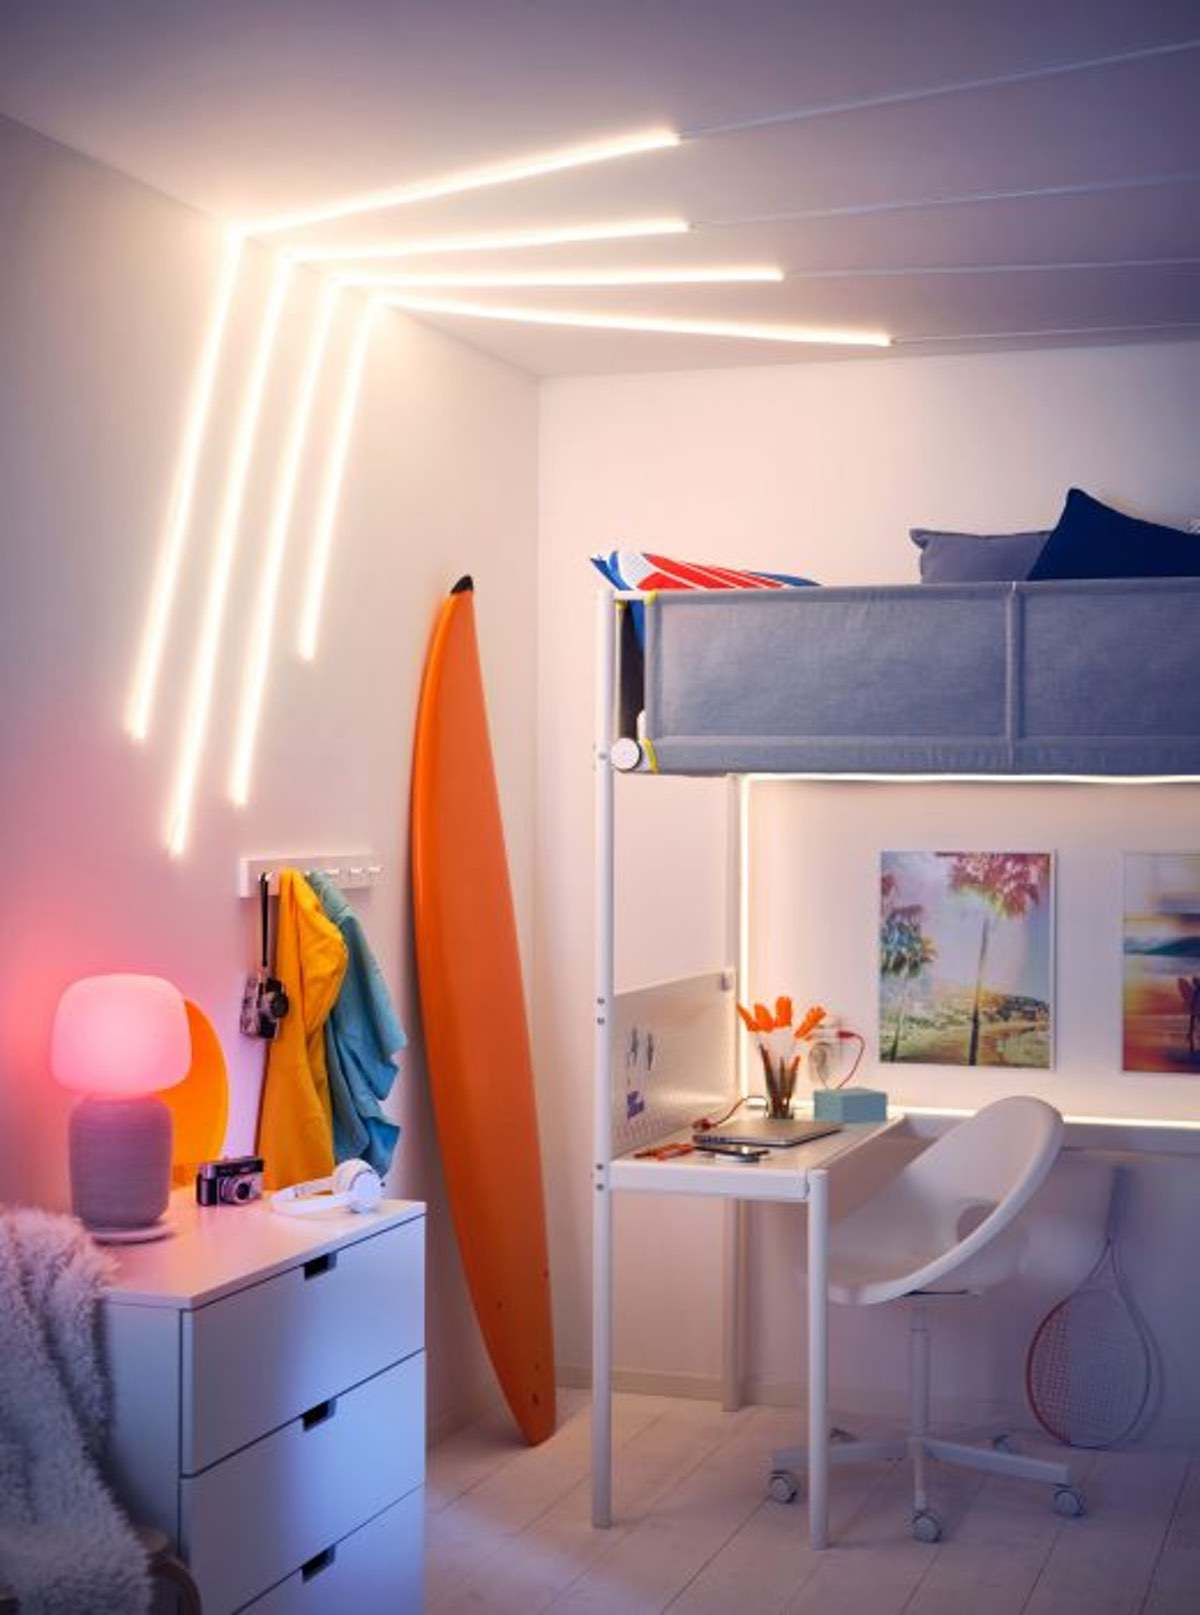 MYRVARV – IKEAS neuste Lichtkreation